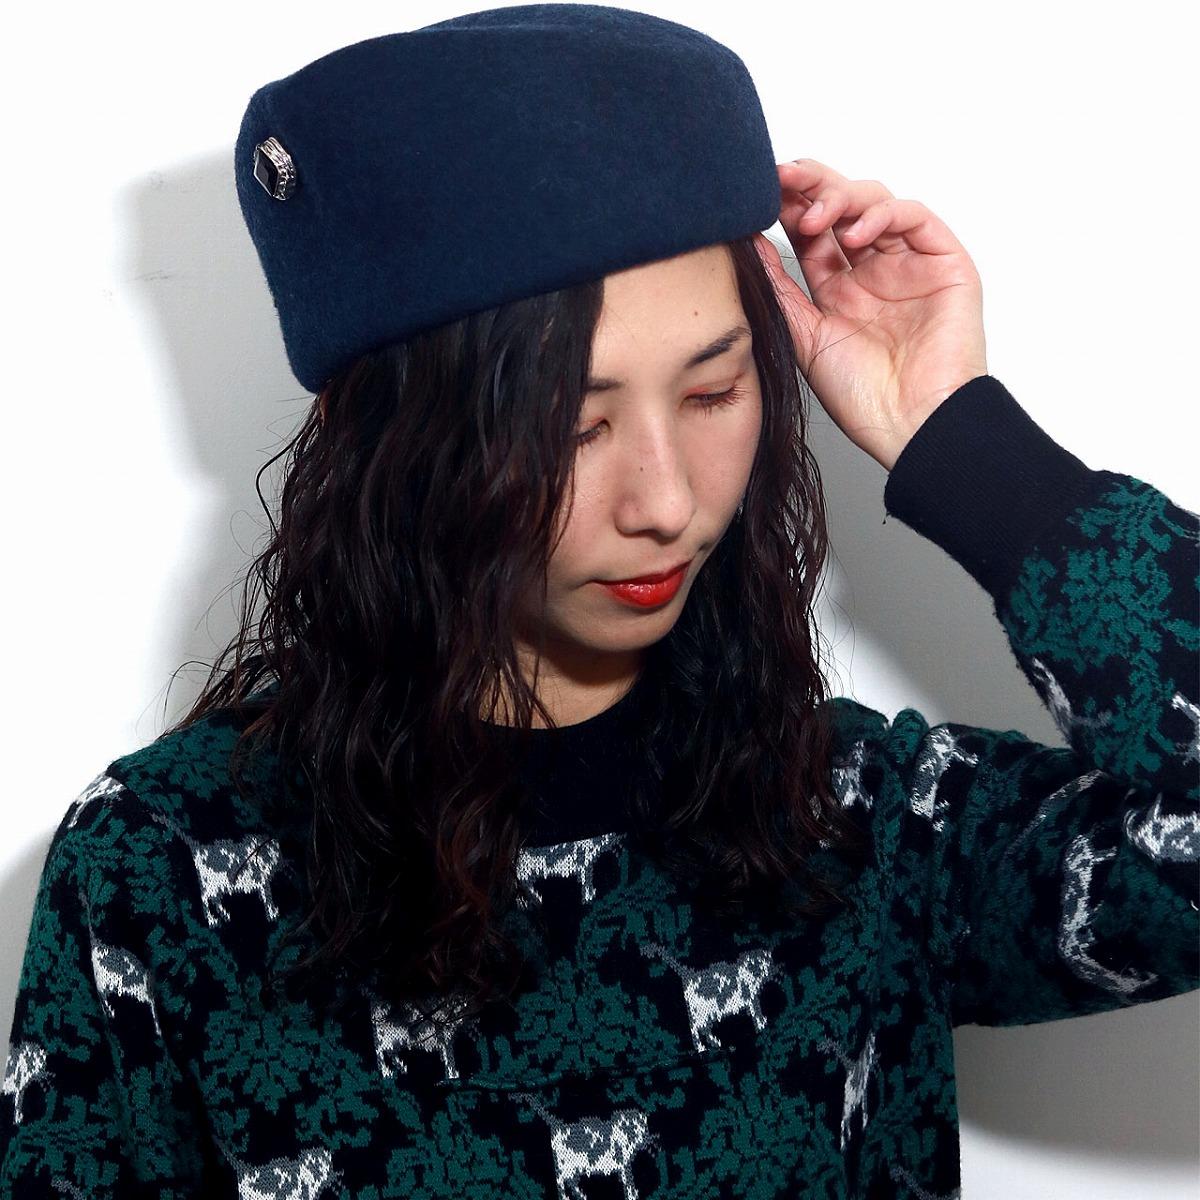 e5b2f7cf5ec928 ELEHELM HAT STORE: It is a gift Christmas present in gully Arno Sor Bhatti  Shin pull wool talking hat Lady's hat fashion felt 紺杢 navy [hat] Mother's  Day ...